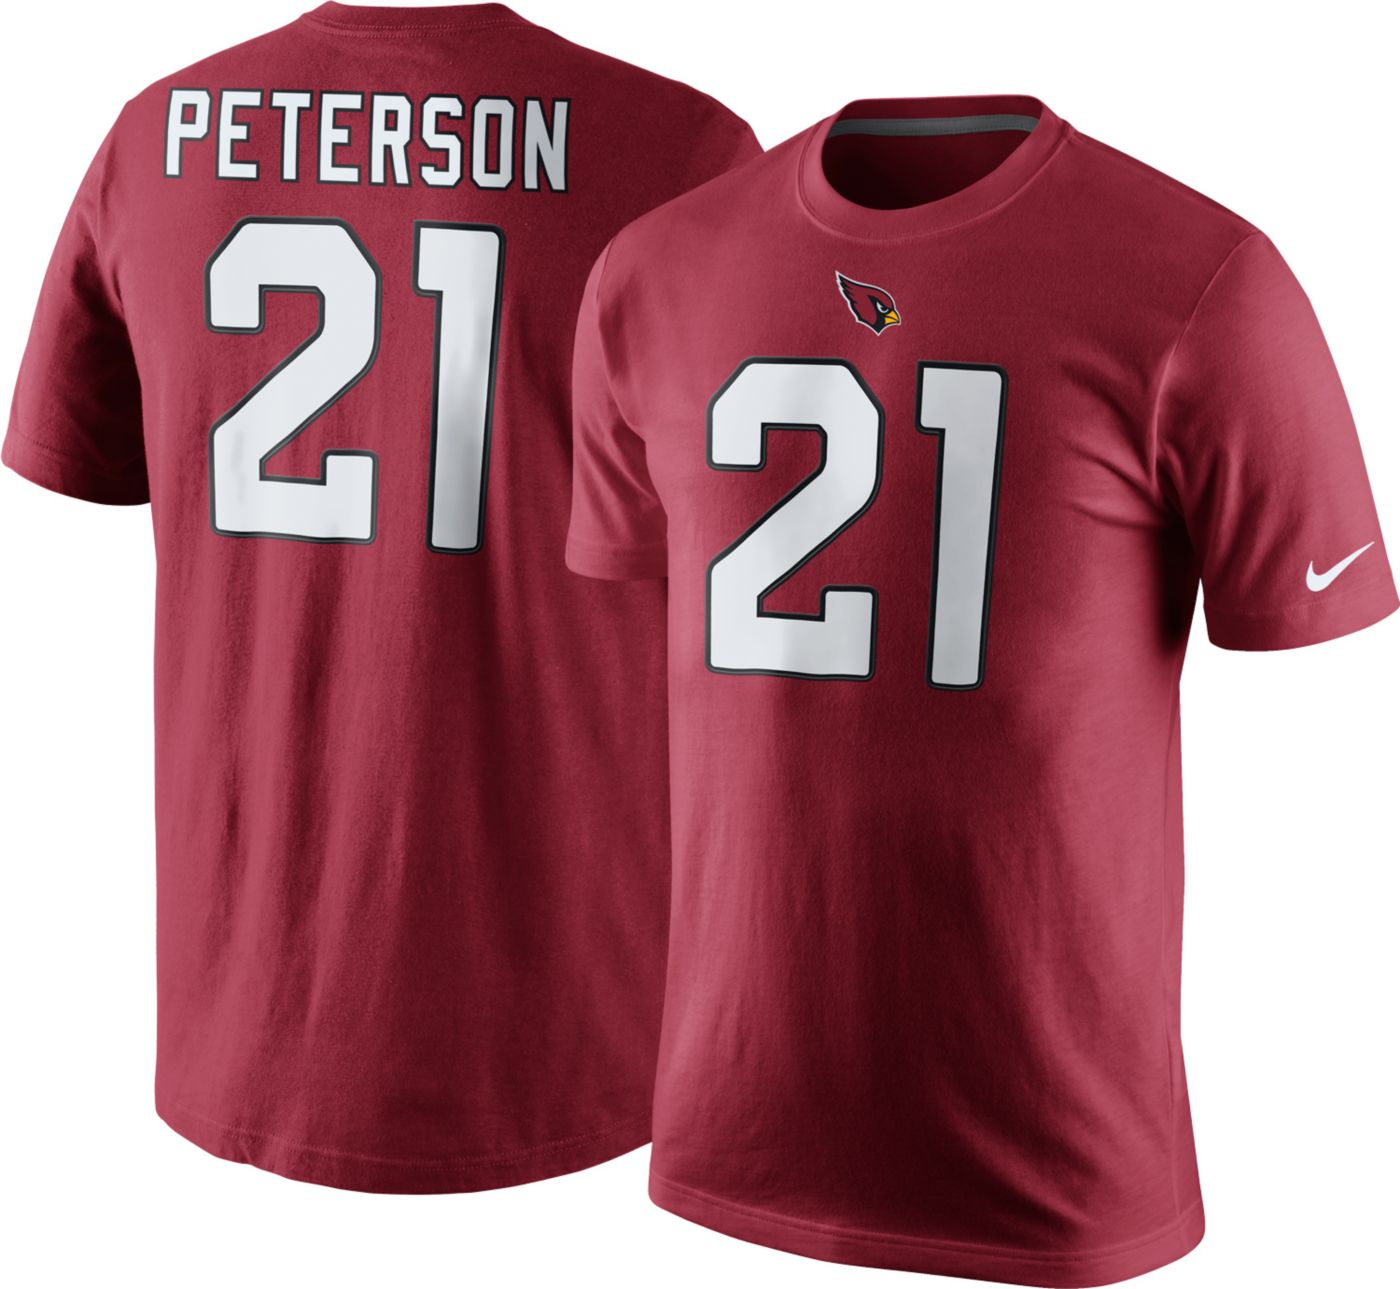 Nike Men's Arizona Cardinals Patrick Peterson #21 Pride Red T-Shirt